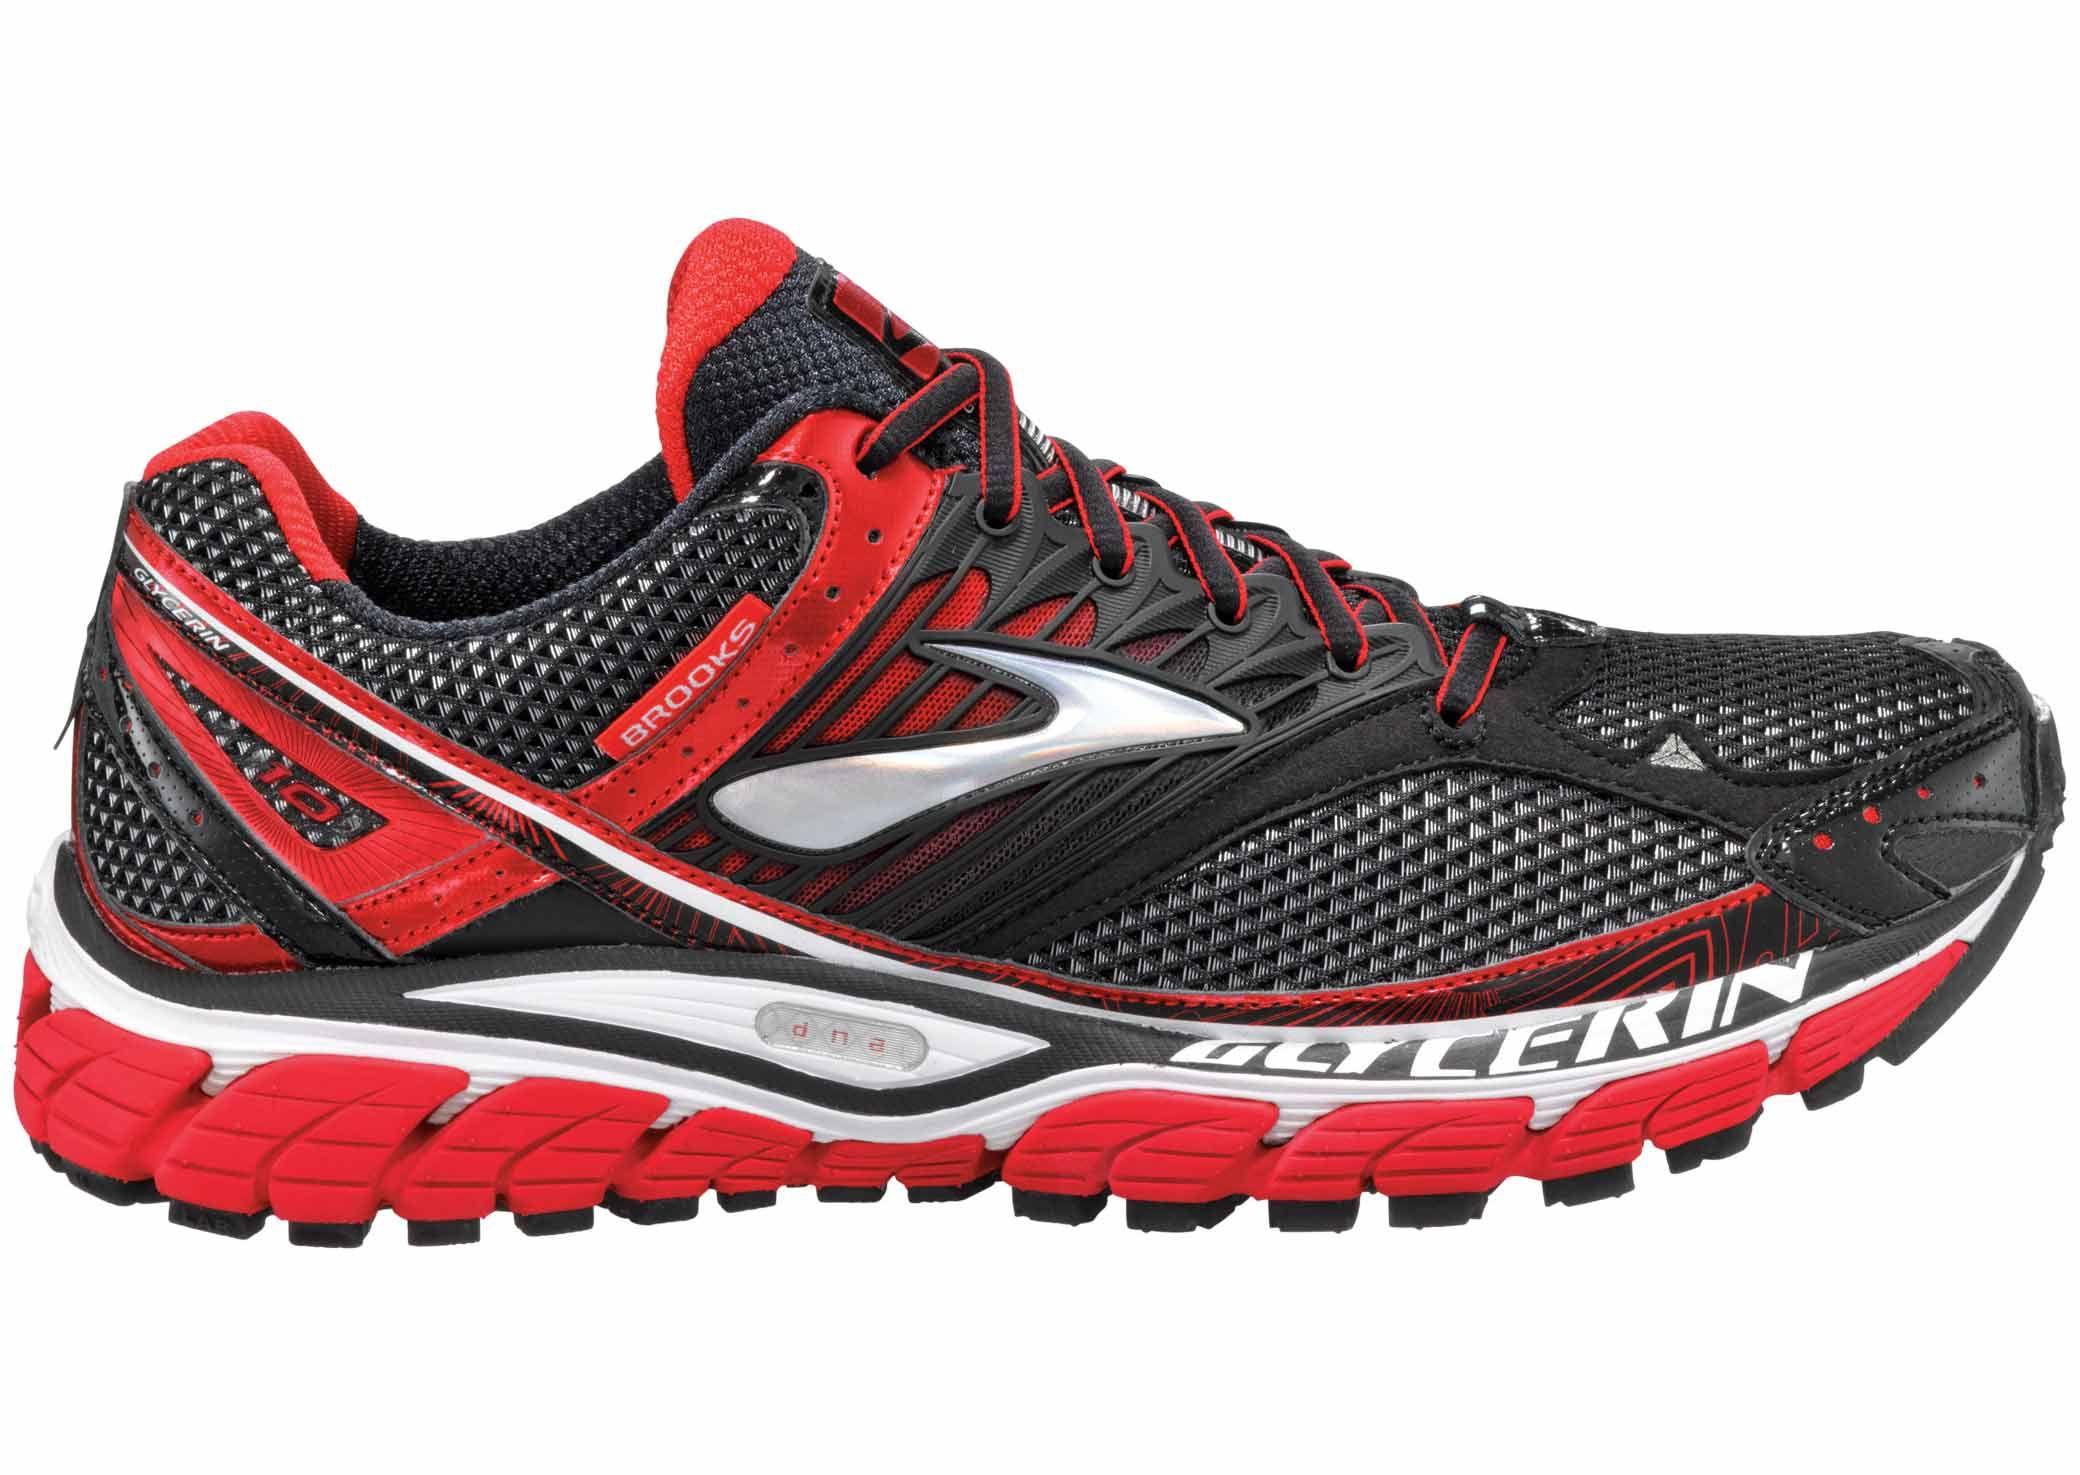 685f74f4085 Brooks Glycerin 10  Brooks premier men s neutral running shoe - with DNA  O